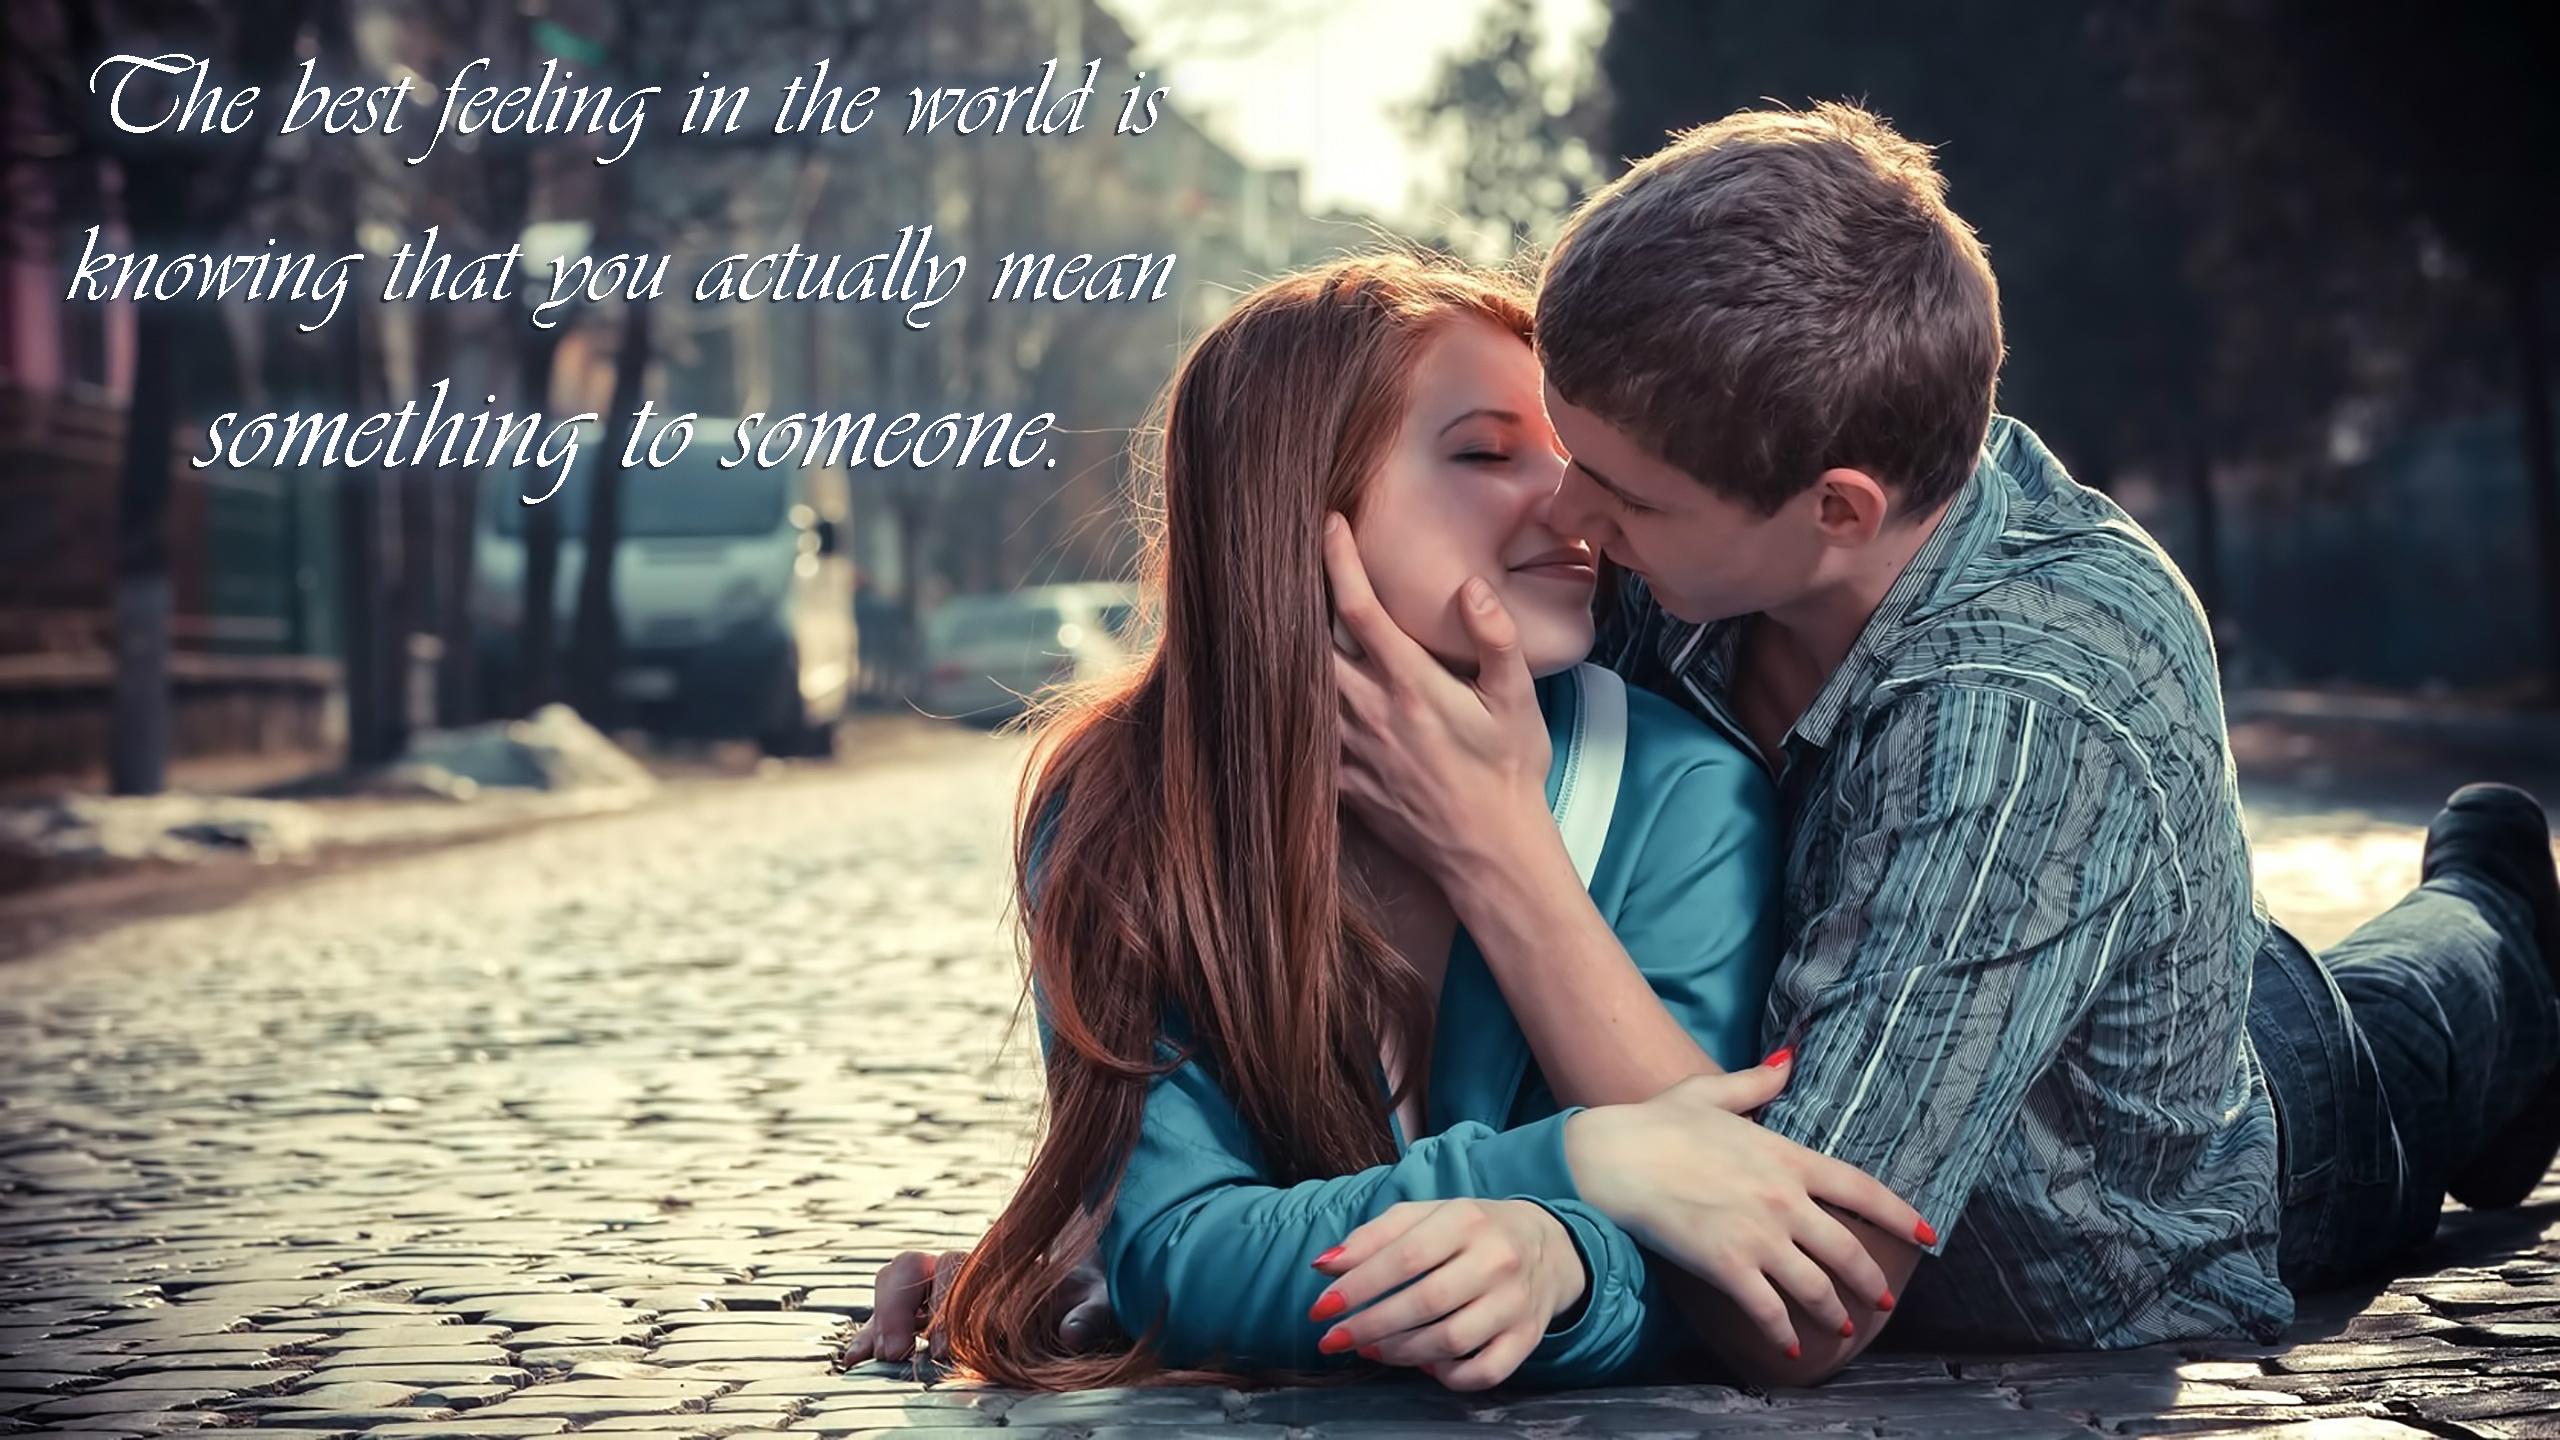 Cute Kissing Couple World Best Cute Couple 790332 Hd